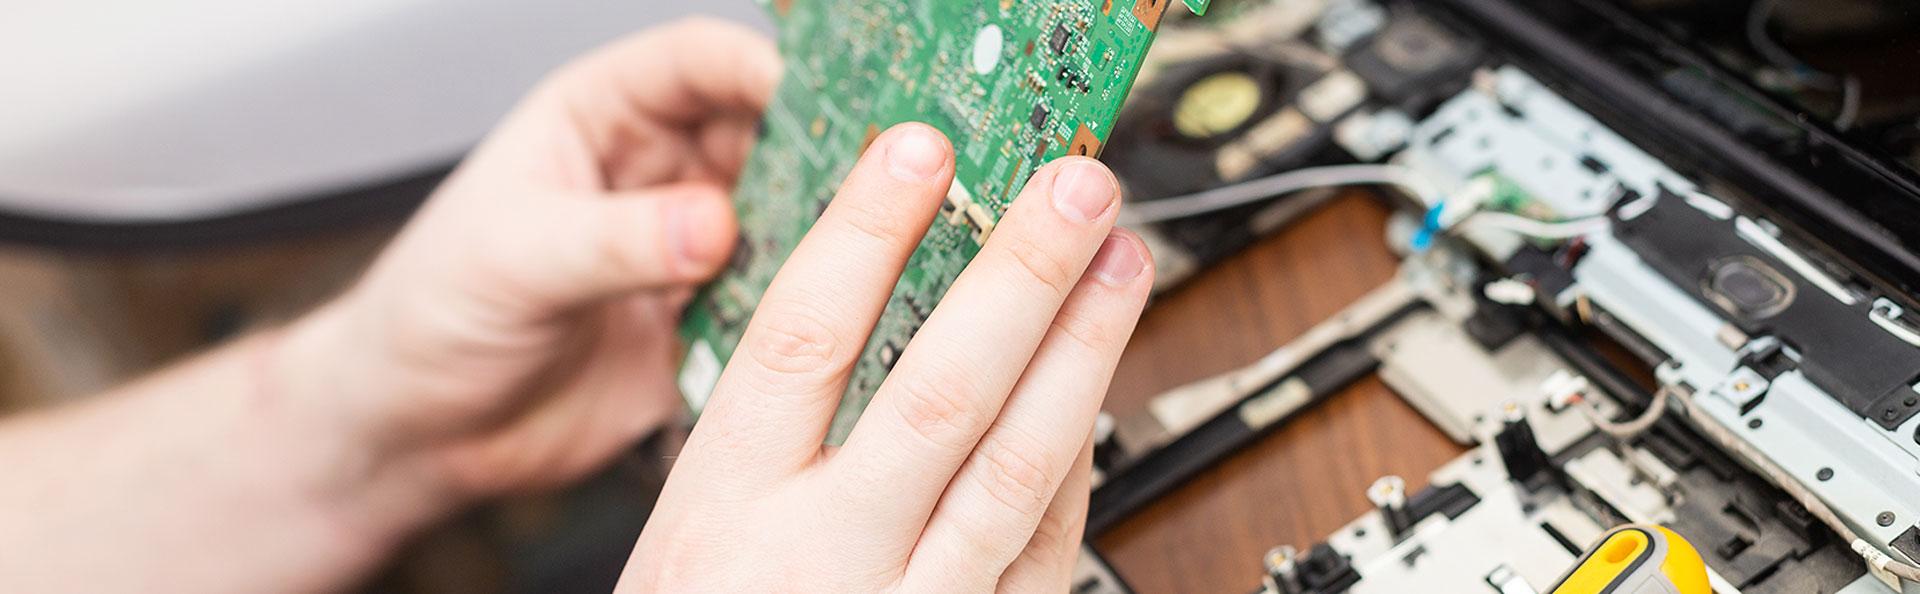 Mitchell PC Repair technician repairing hardware issues.